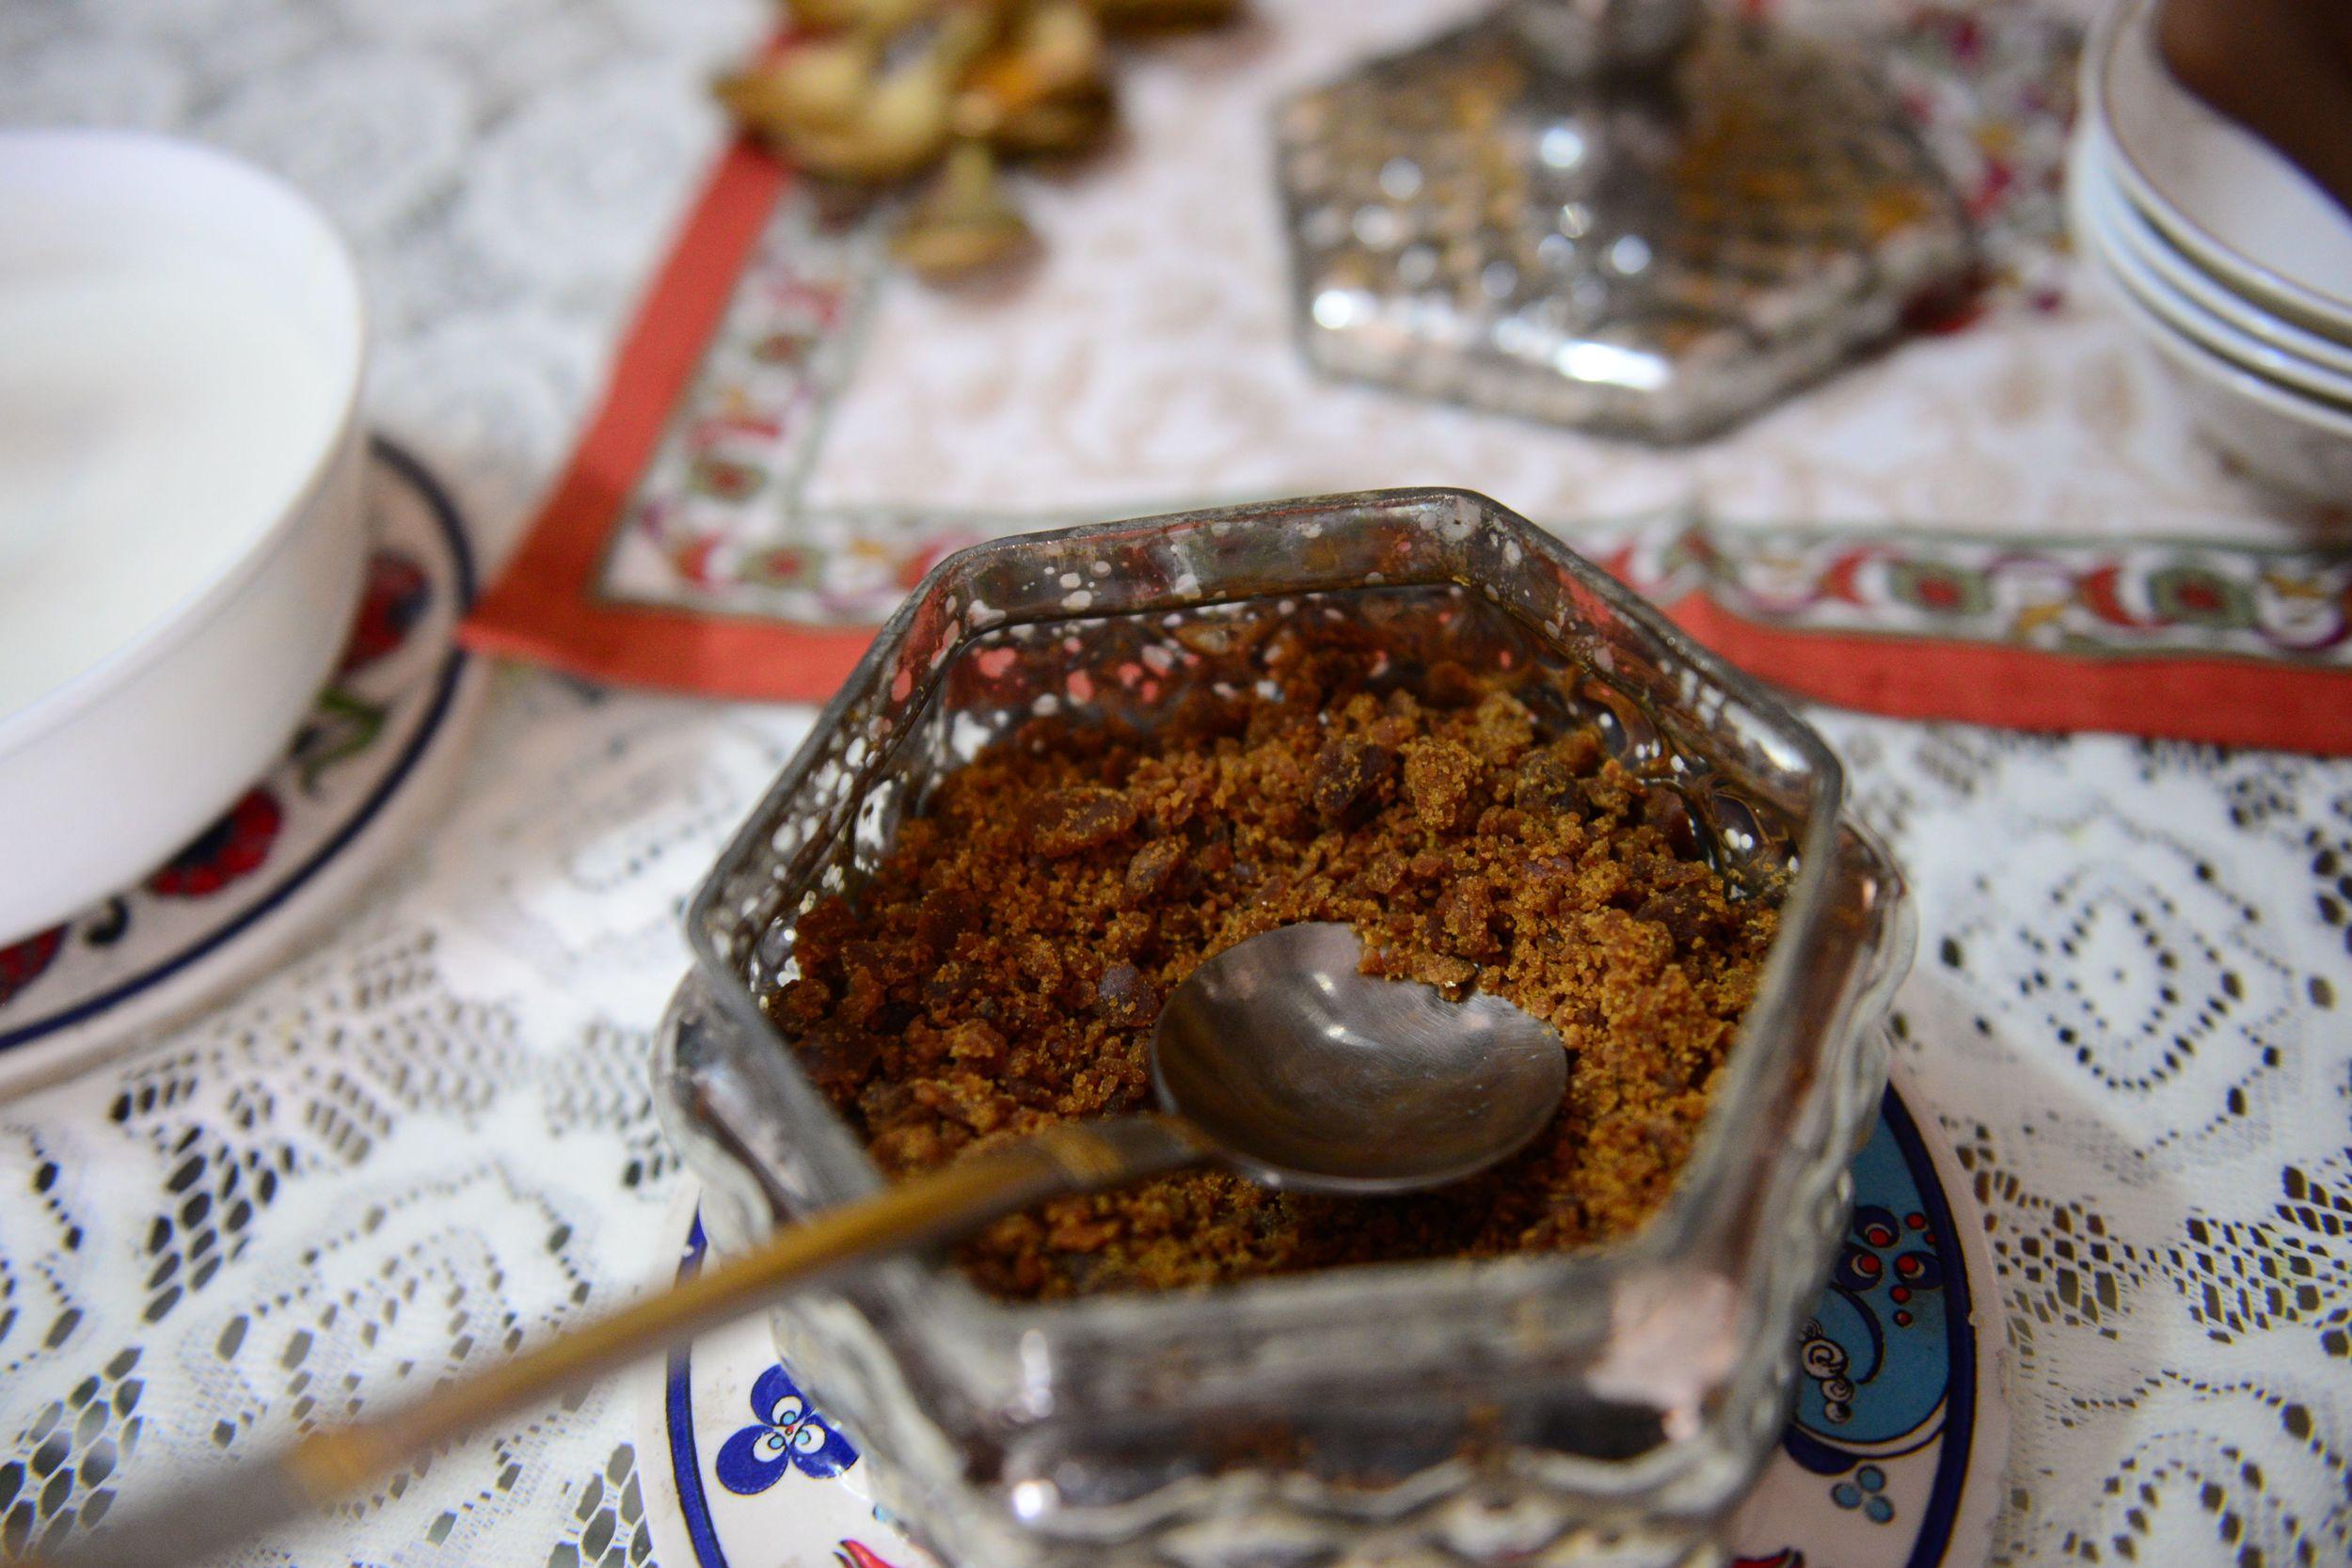 Sprinkle some homemade gud -(outstanding)